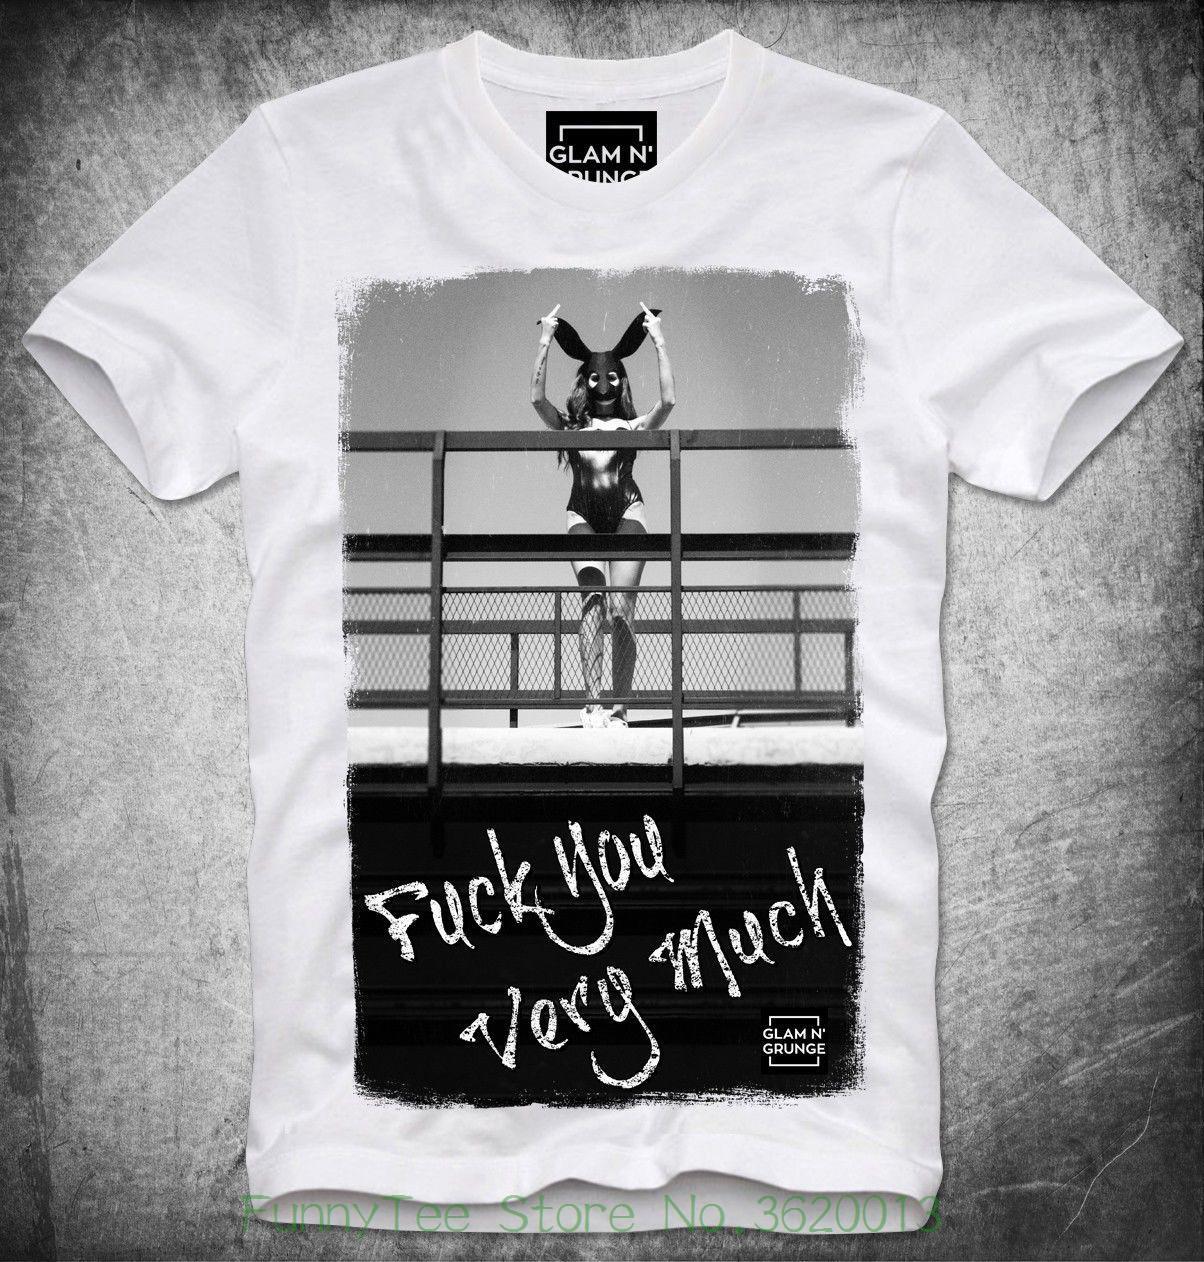 04754a714 Compre Glam N Grunge Camiseta Sexy Girl Fuck You Muito Coelho Mittelfinger  Dedo Hba De Aaa888teesstore, $19.03 | Pt.Dhgate.Com